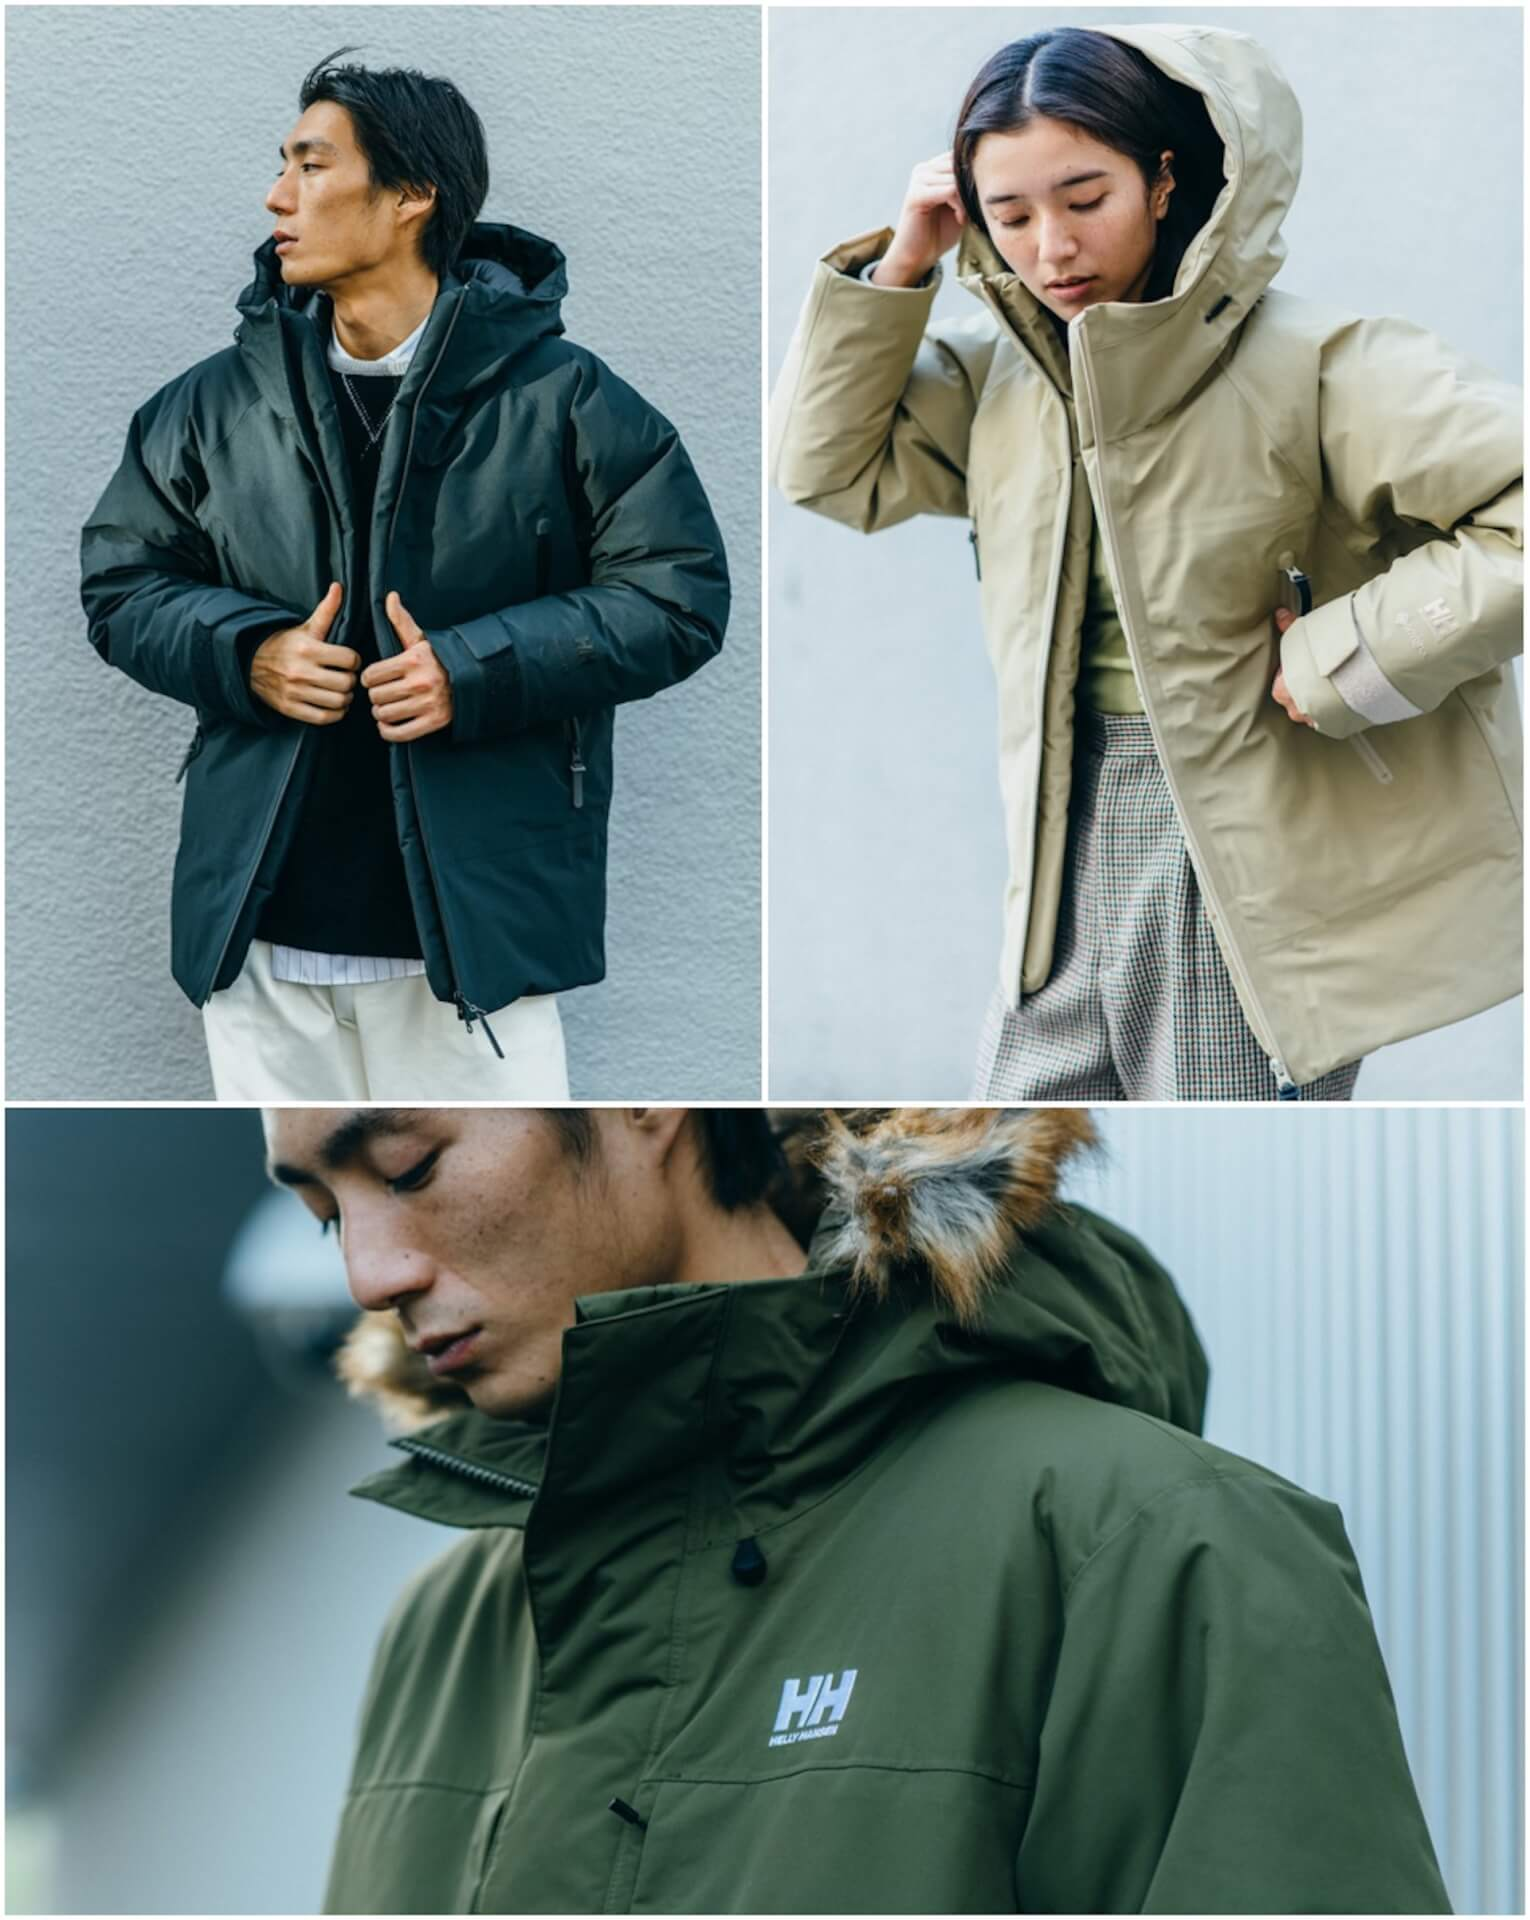 HELLY HANSENから防水透湿性を兼ね備えたハイロフトダウン『Hemsedal Jacket』&『Mager Insulation Jacket』が登場! fashion201215_hellyhansen_down_1